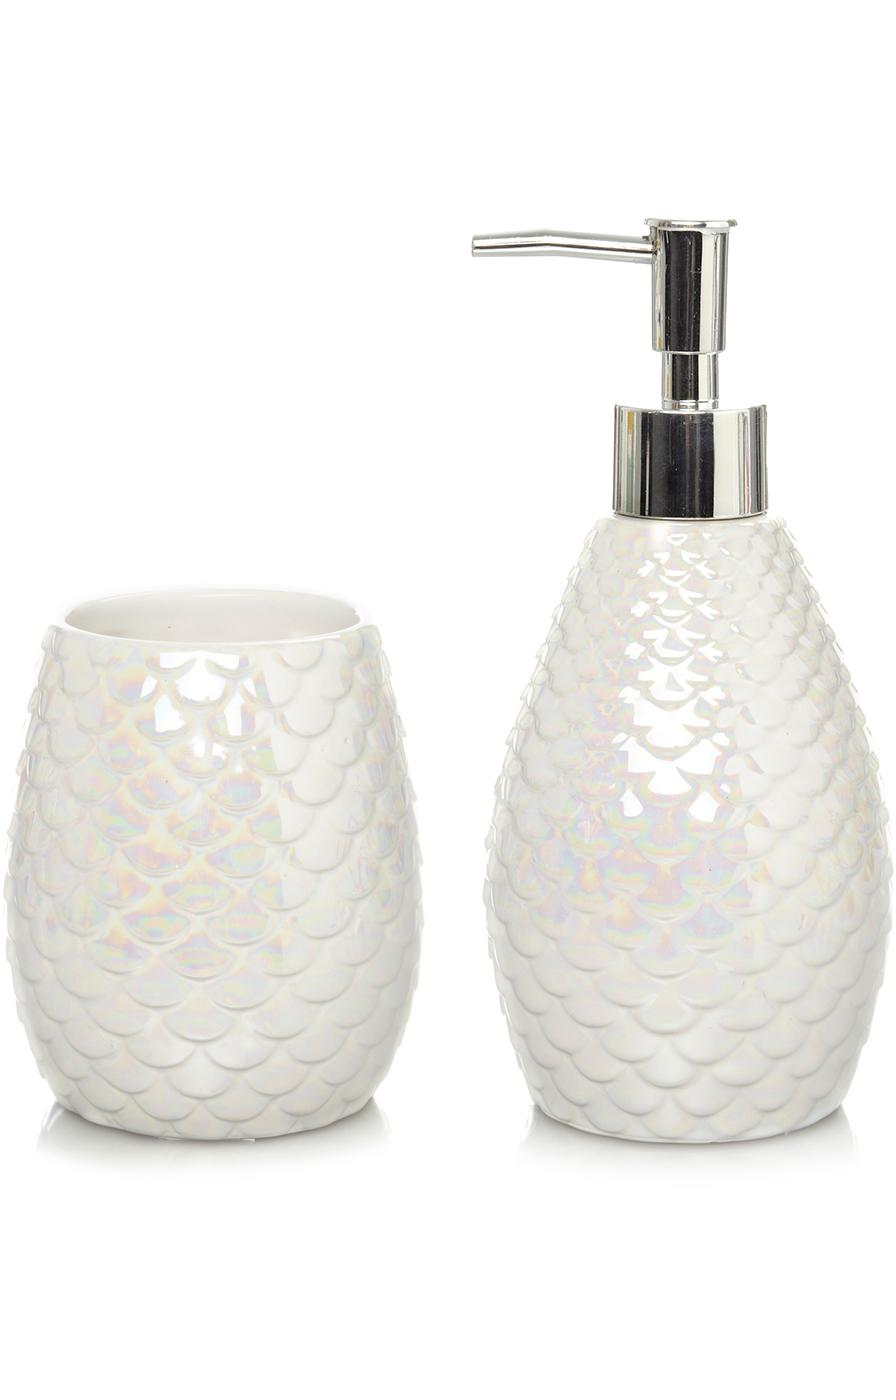 Iridescent Bathroom Accessories Range